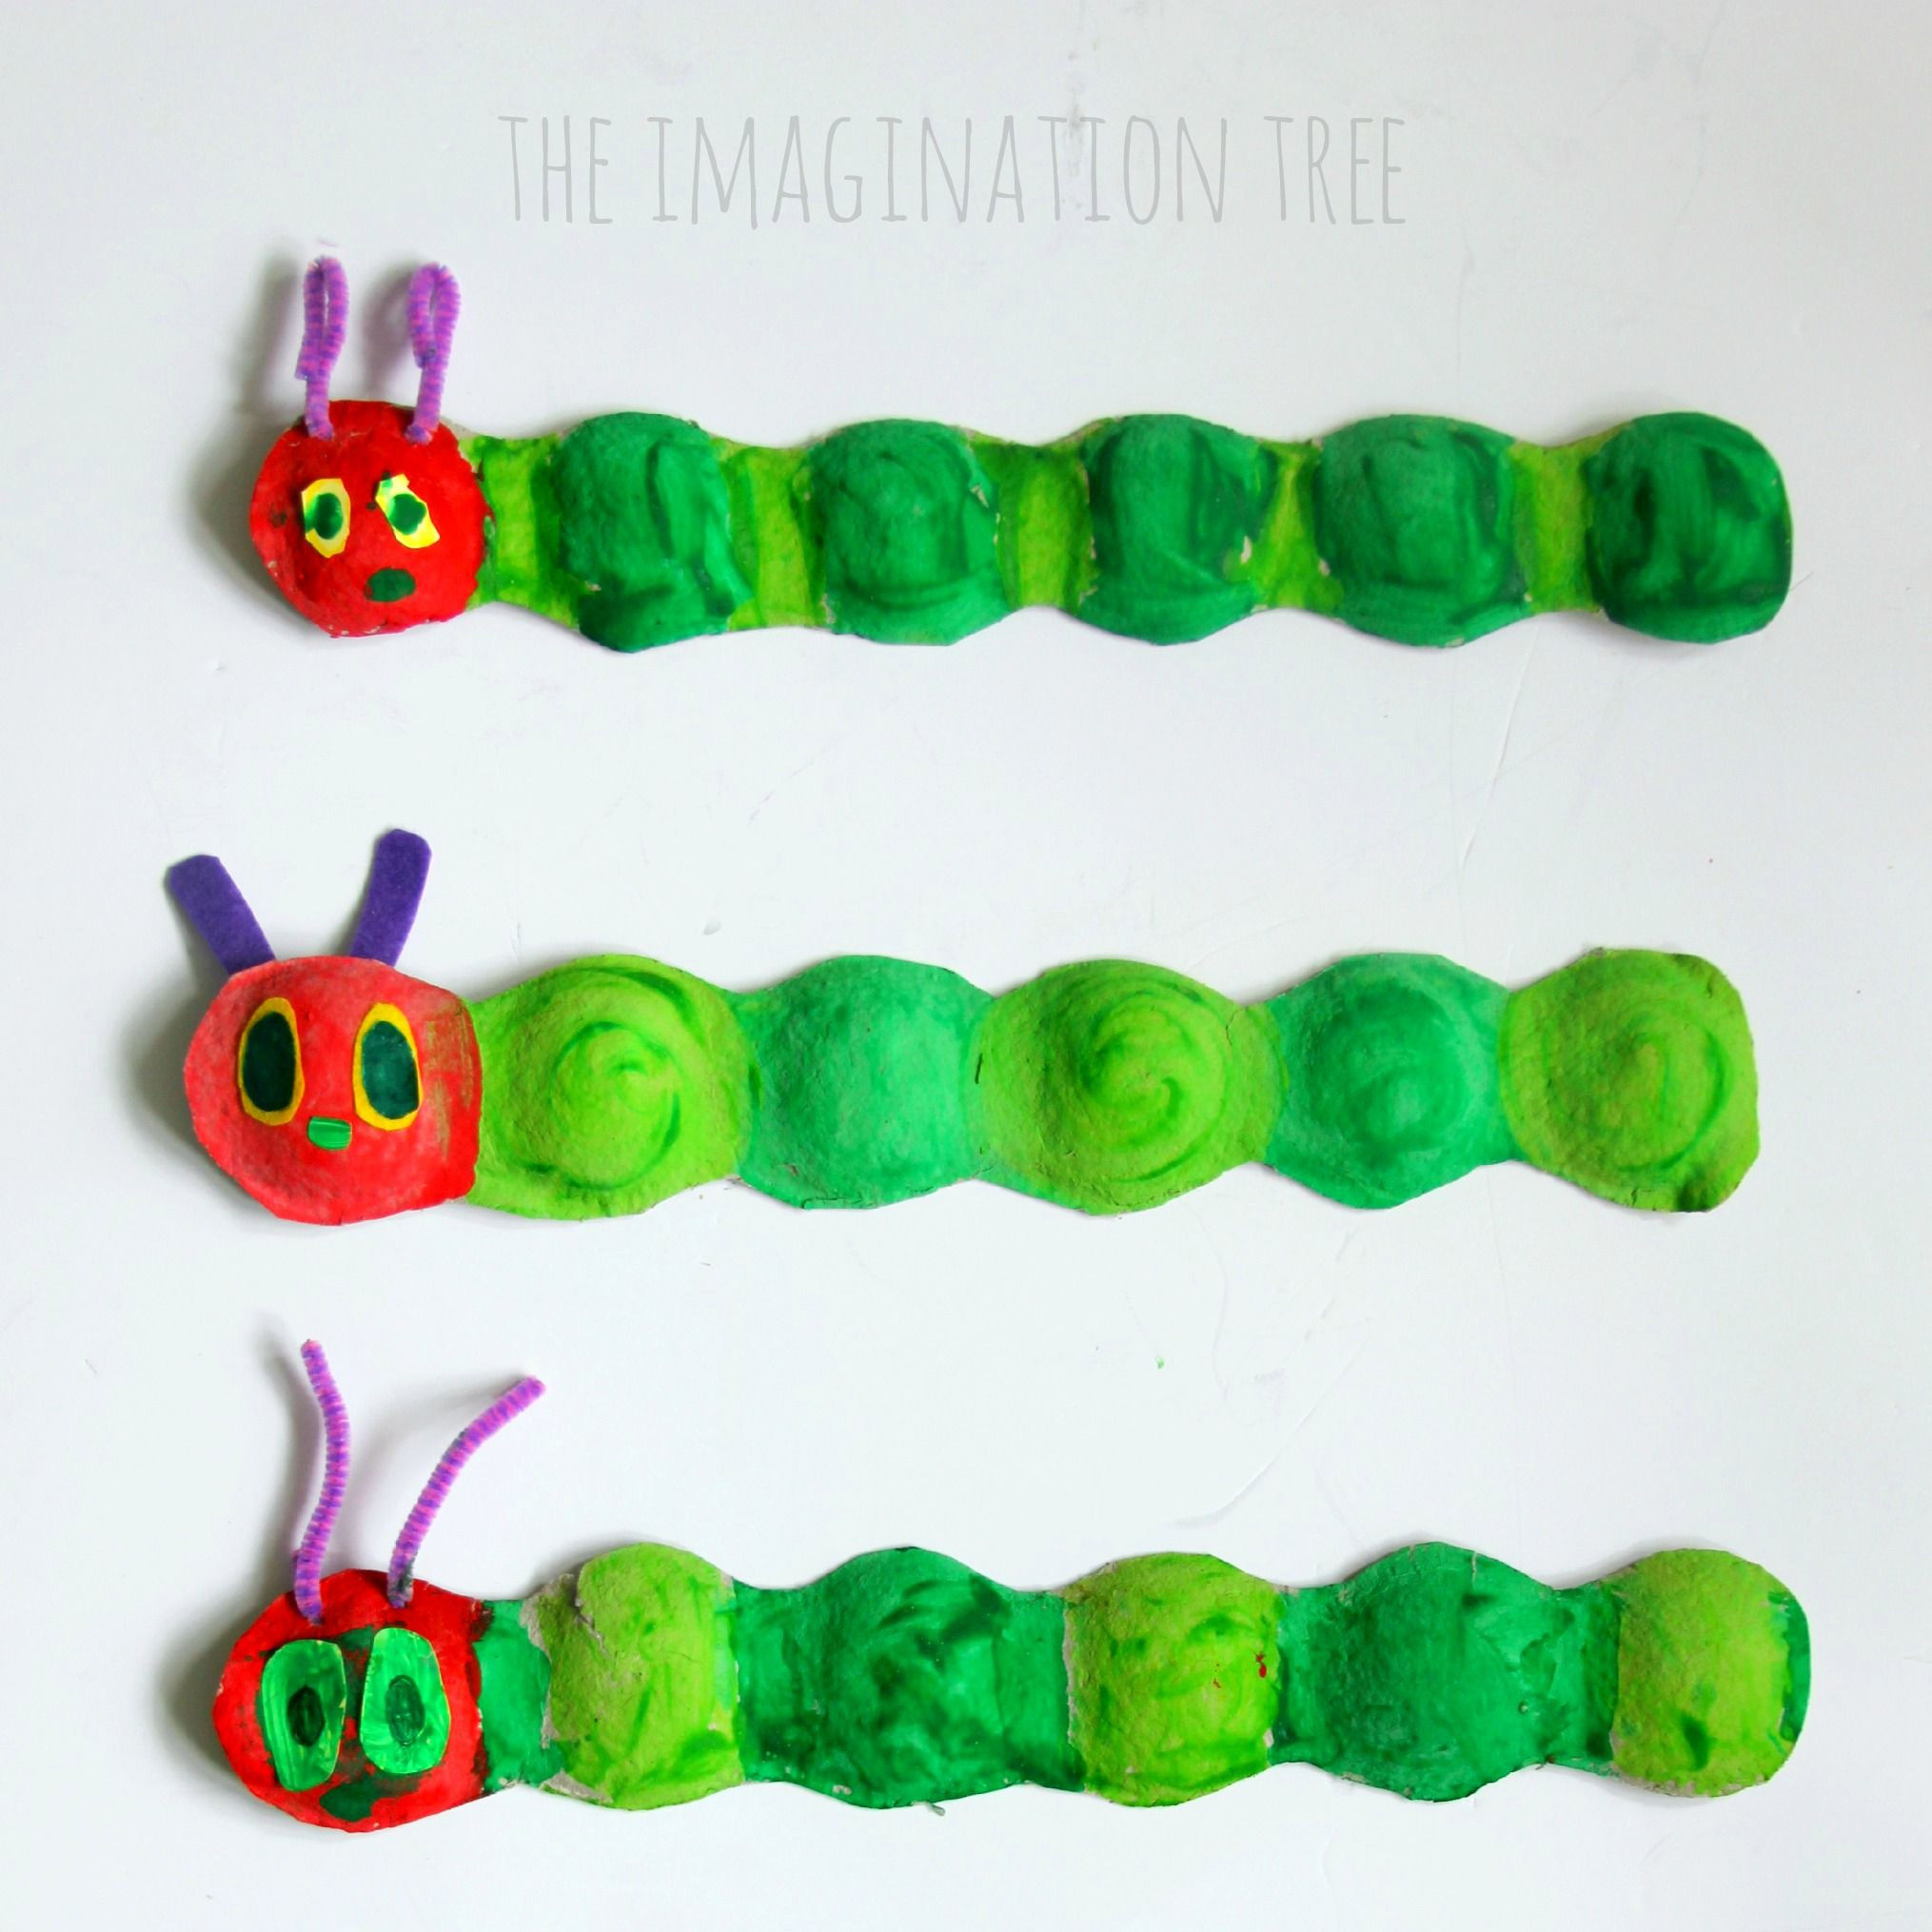 Raupe Nimmersatt Ausmalbild Frisch Fruit Box Hungry Caterpillar Craft Pinterest Elegant Ausmalbilder Sammlung